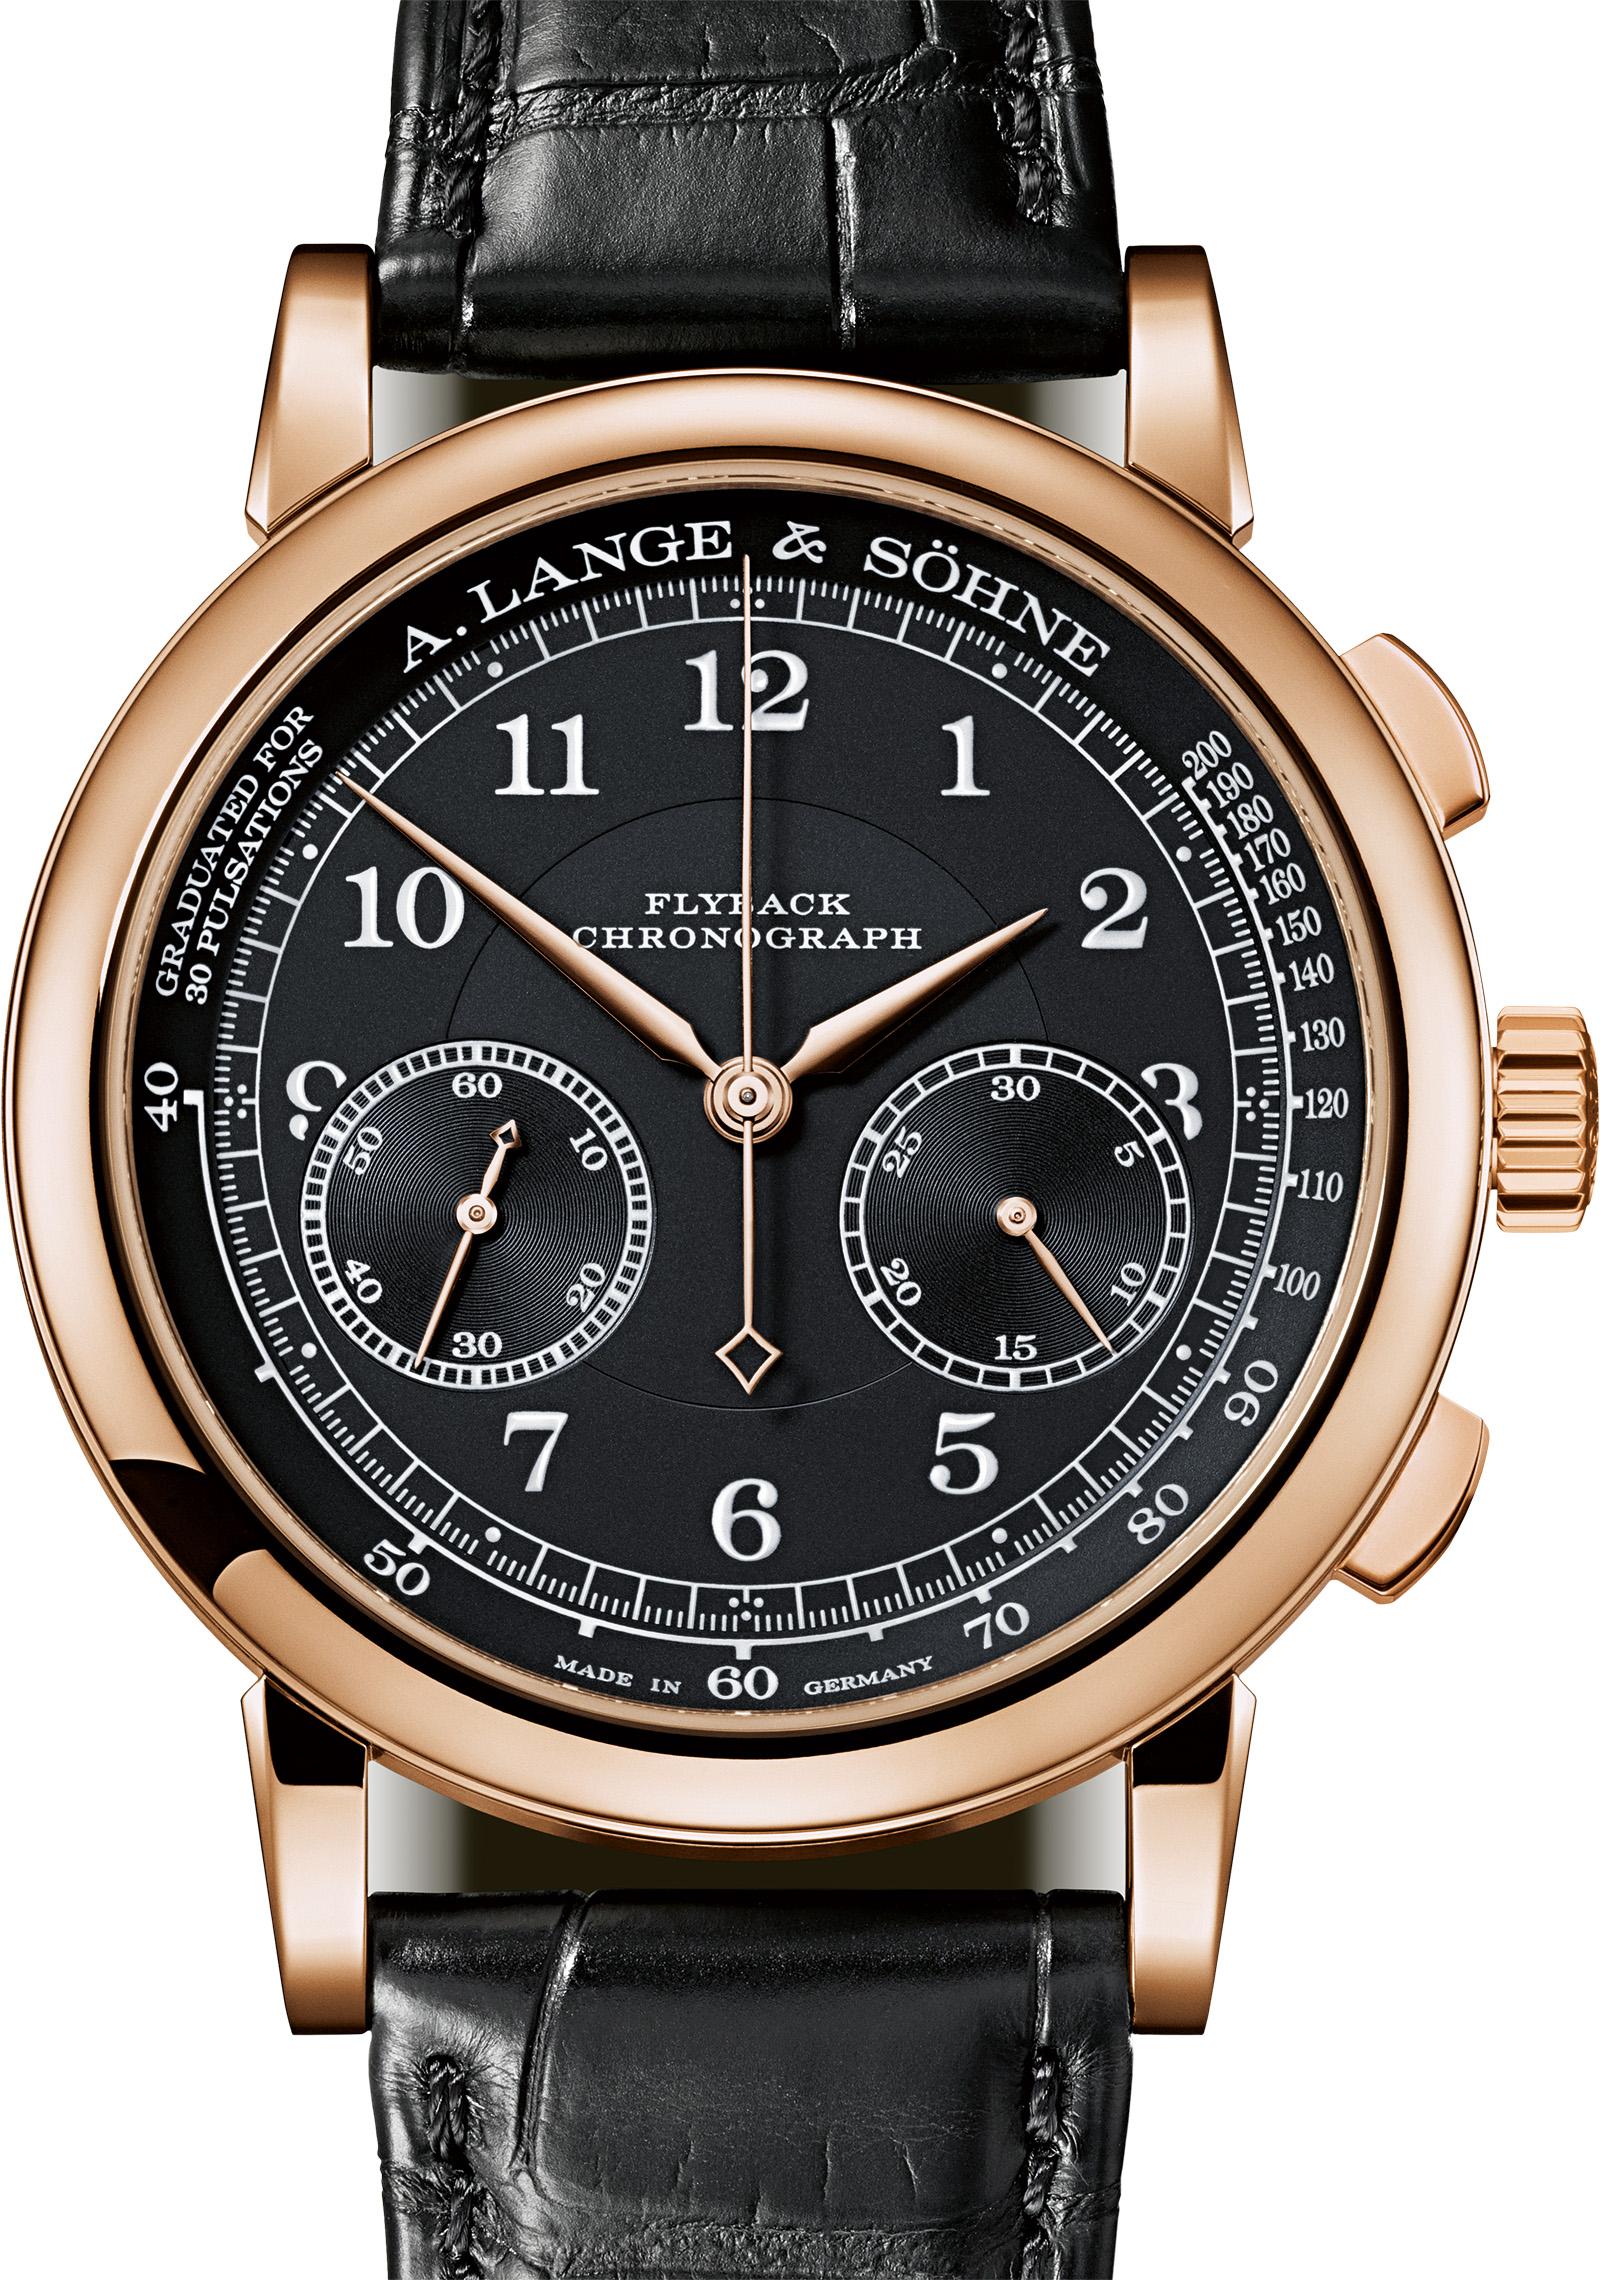 Lange 1815 Chronograph Pink Gold black dial